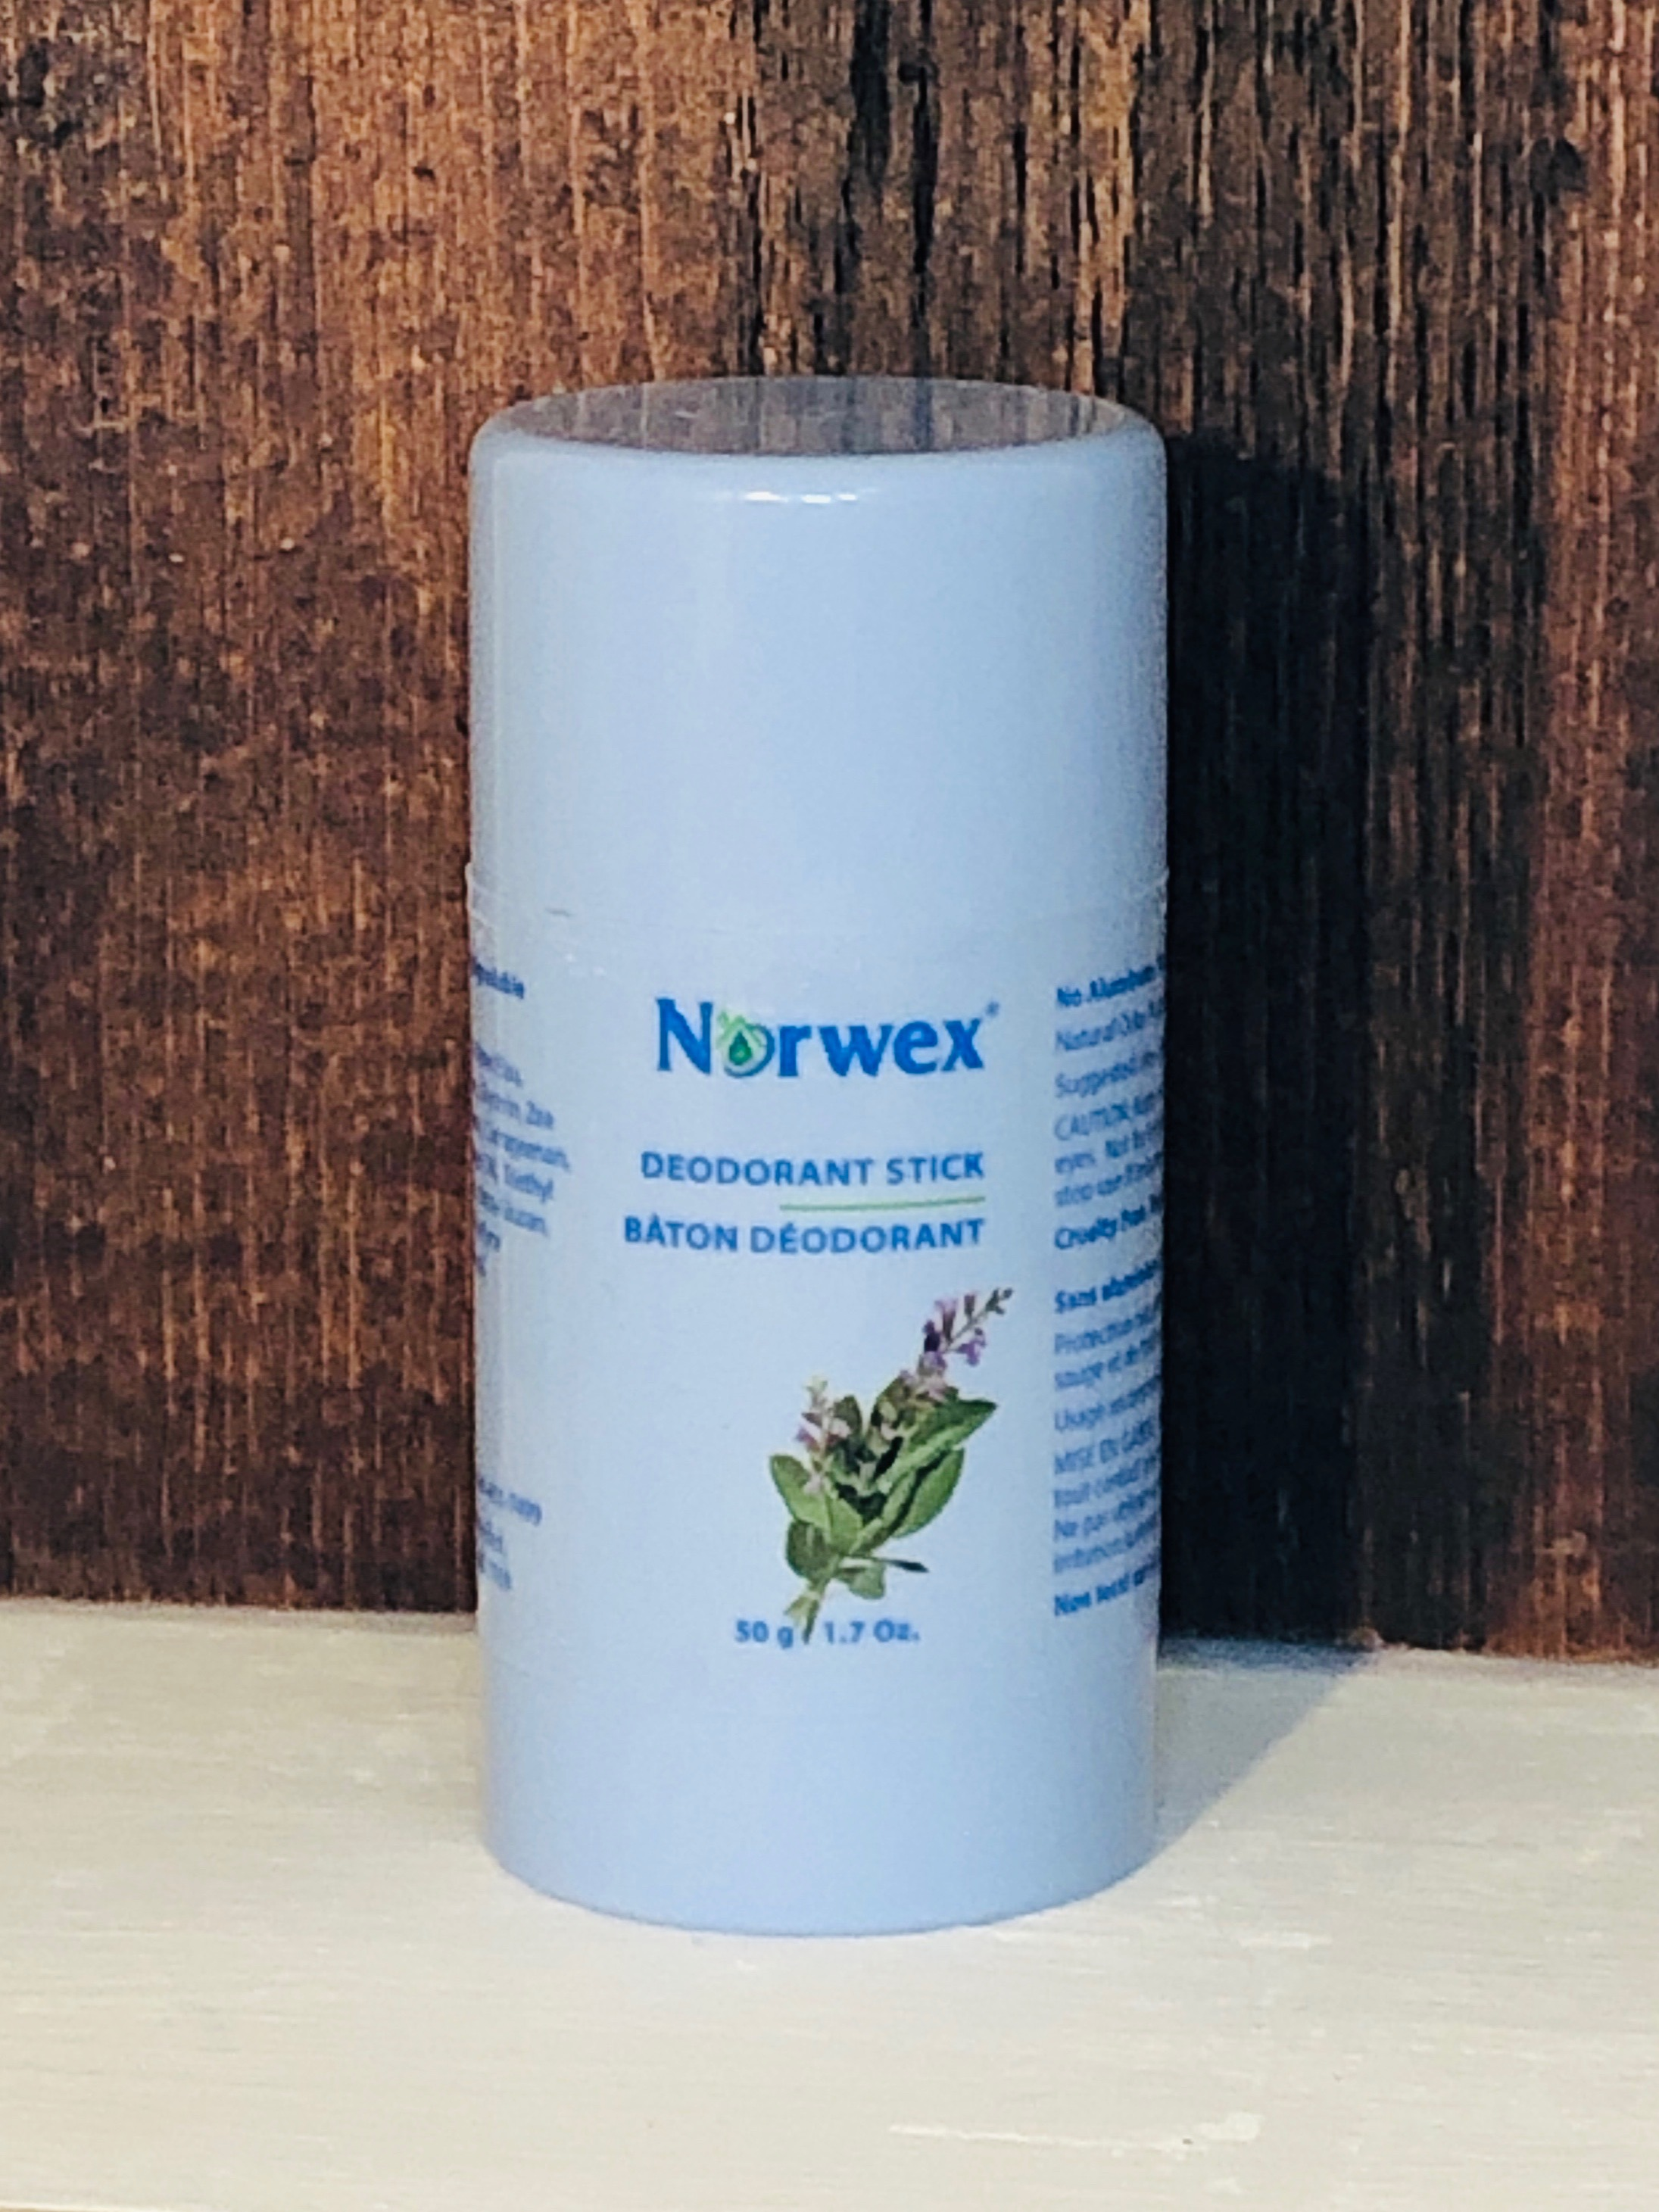 Norwex Deodorant